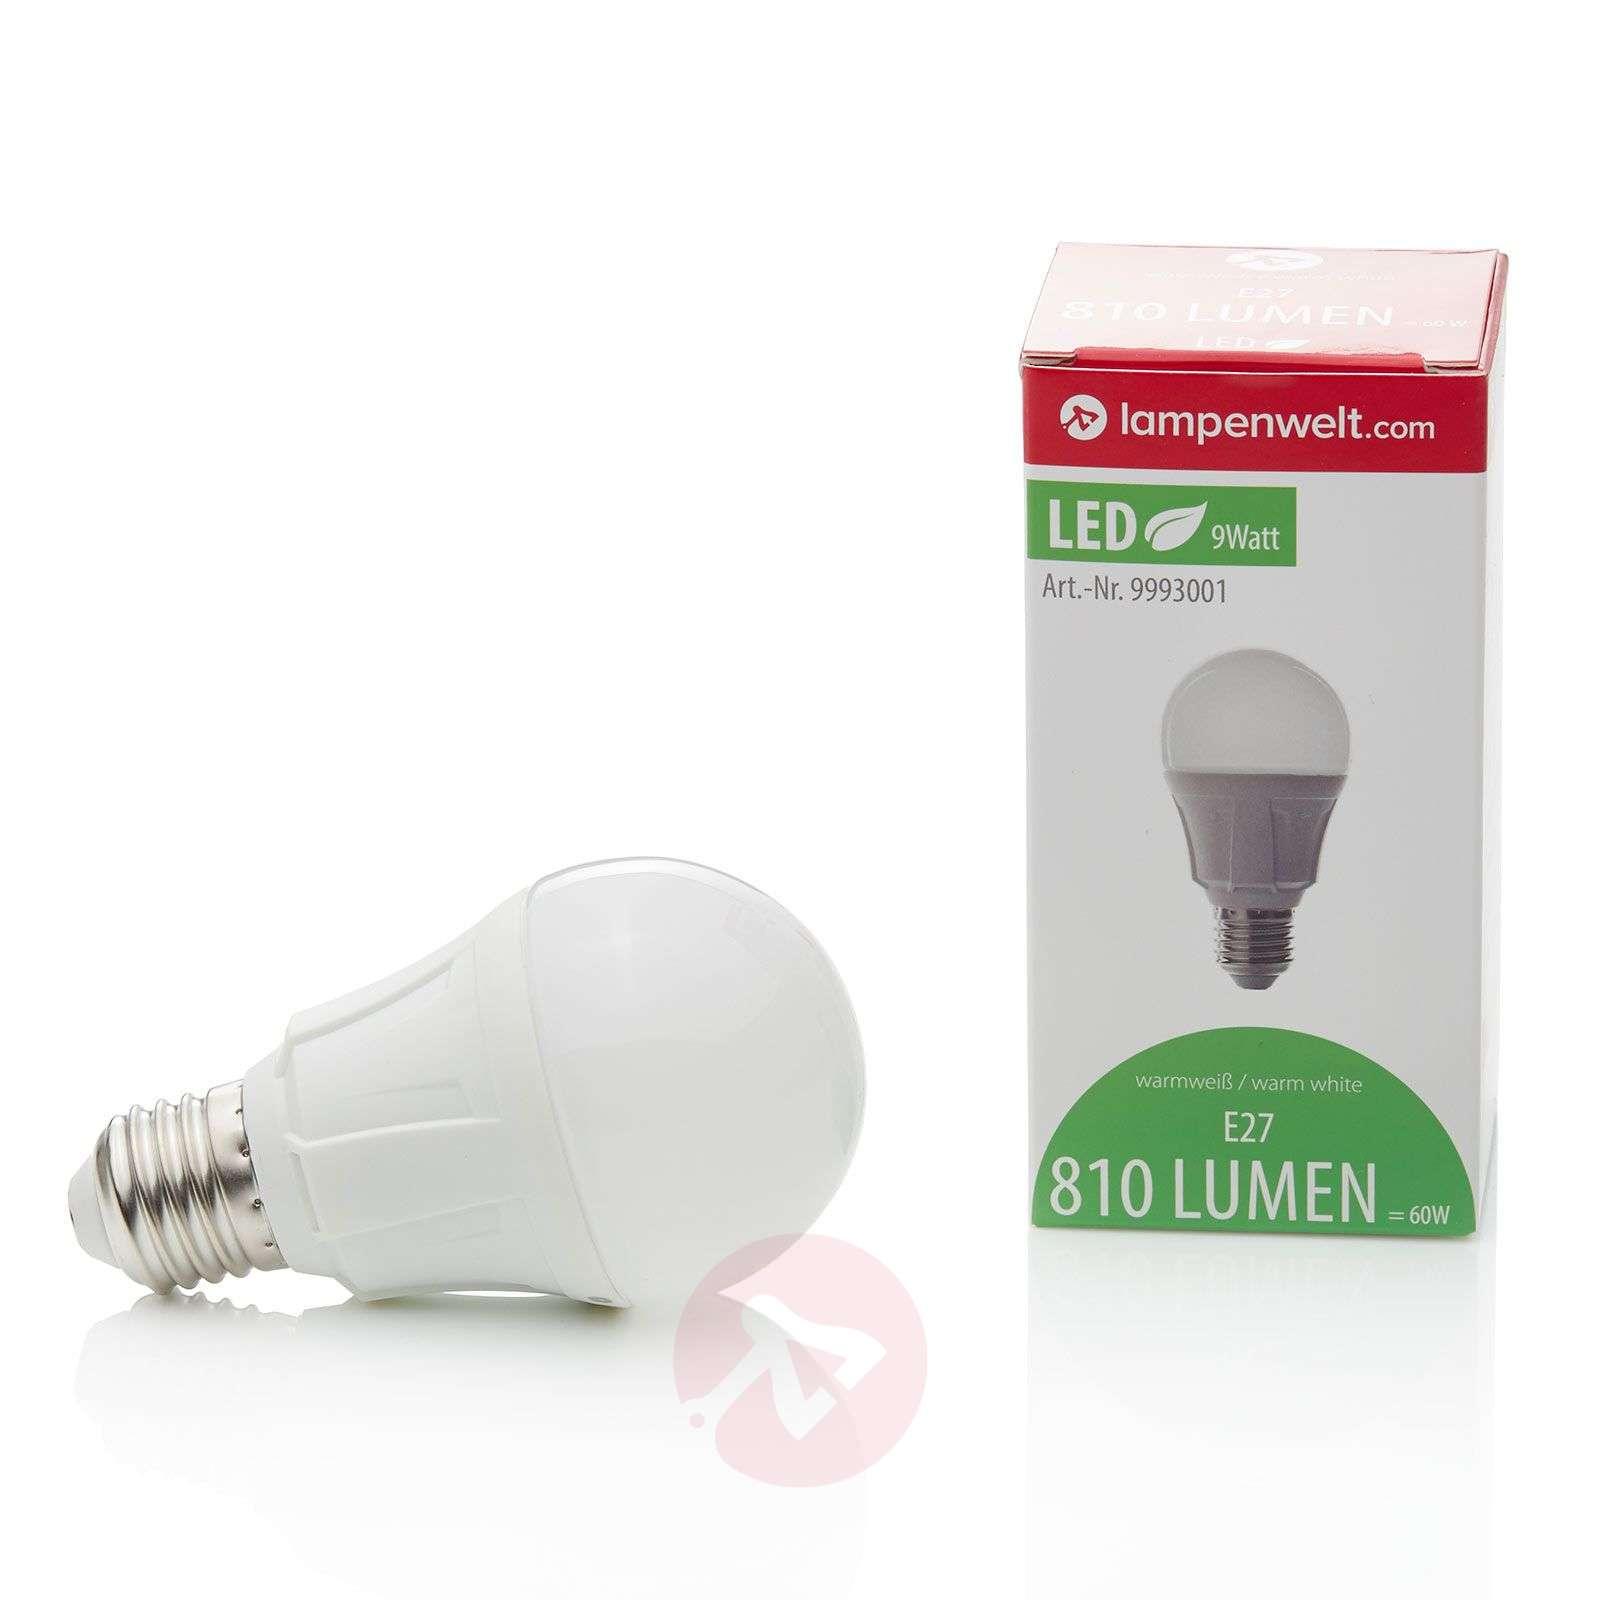 Hehkulampun muotoinen LED-lamppu E27 9W 830-9993001-02